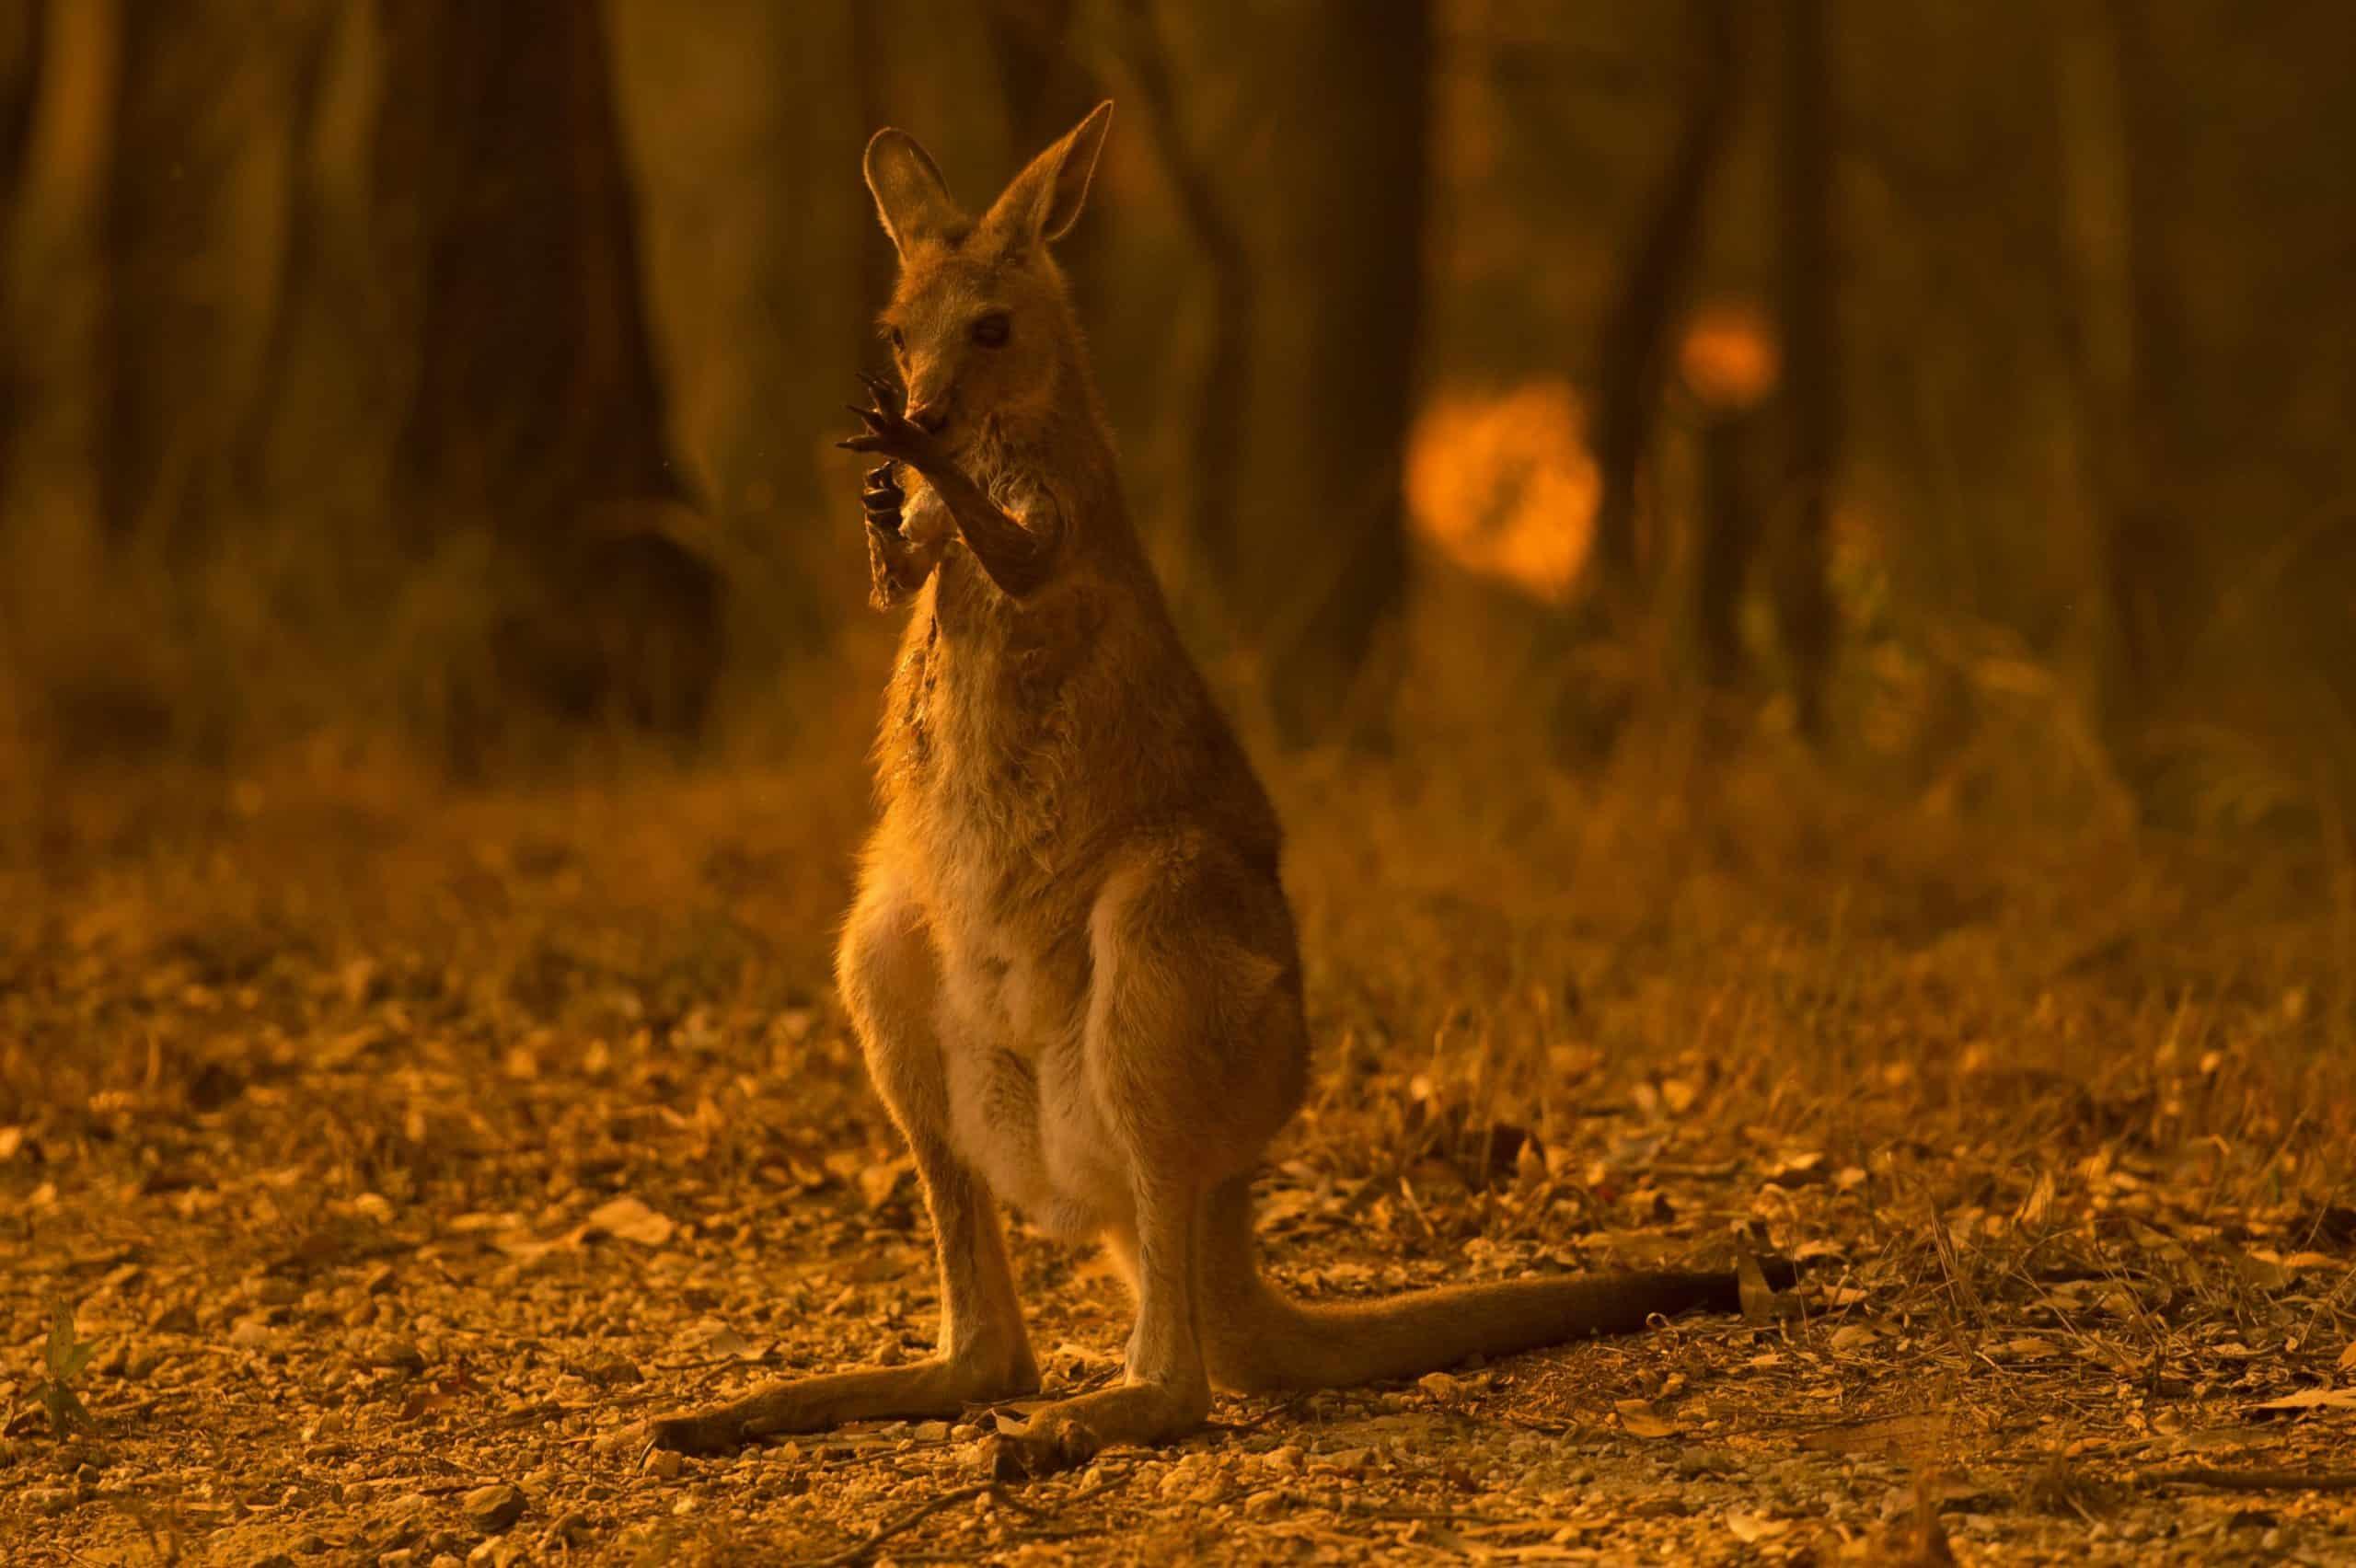 Australia fires kill half a billion animals as crisis mounts